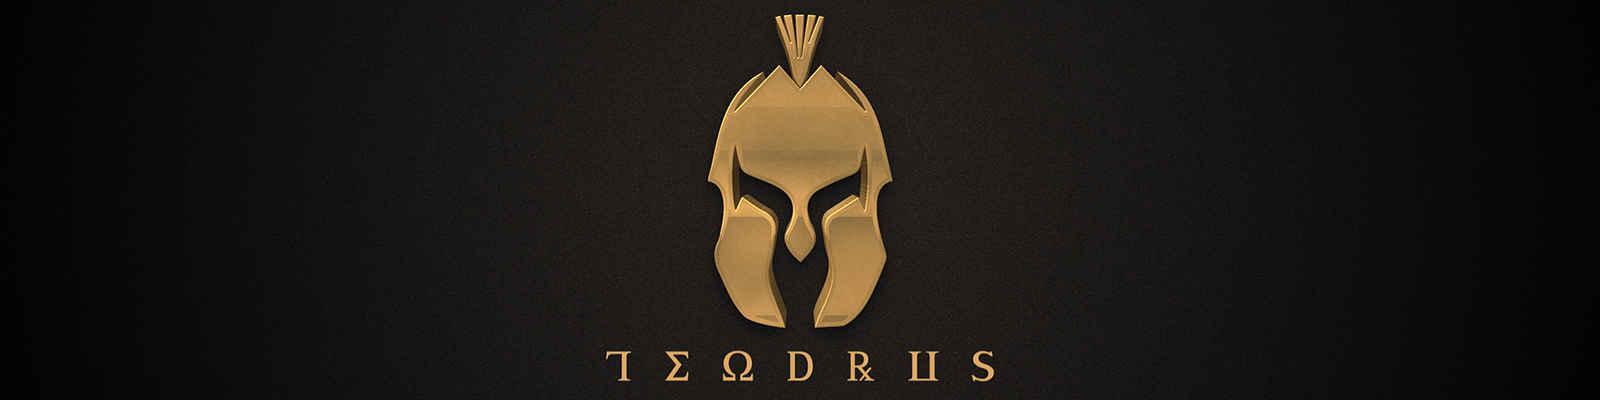 Teodrus Dijital banner fotograf